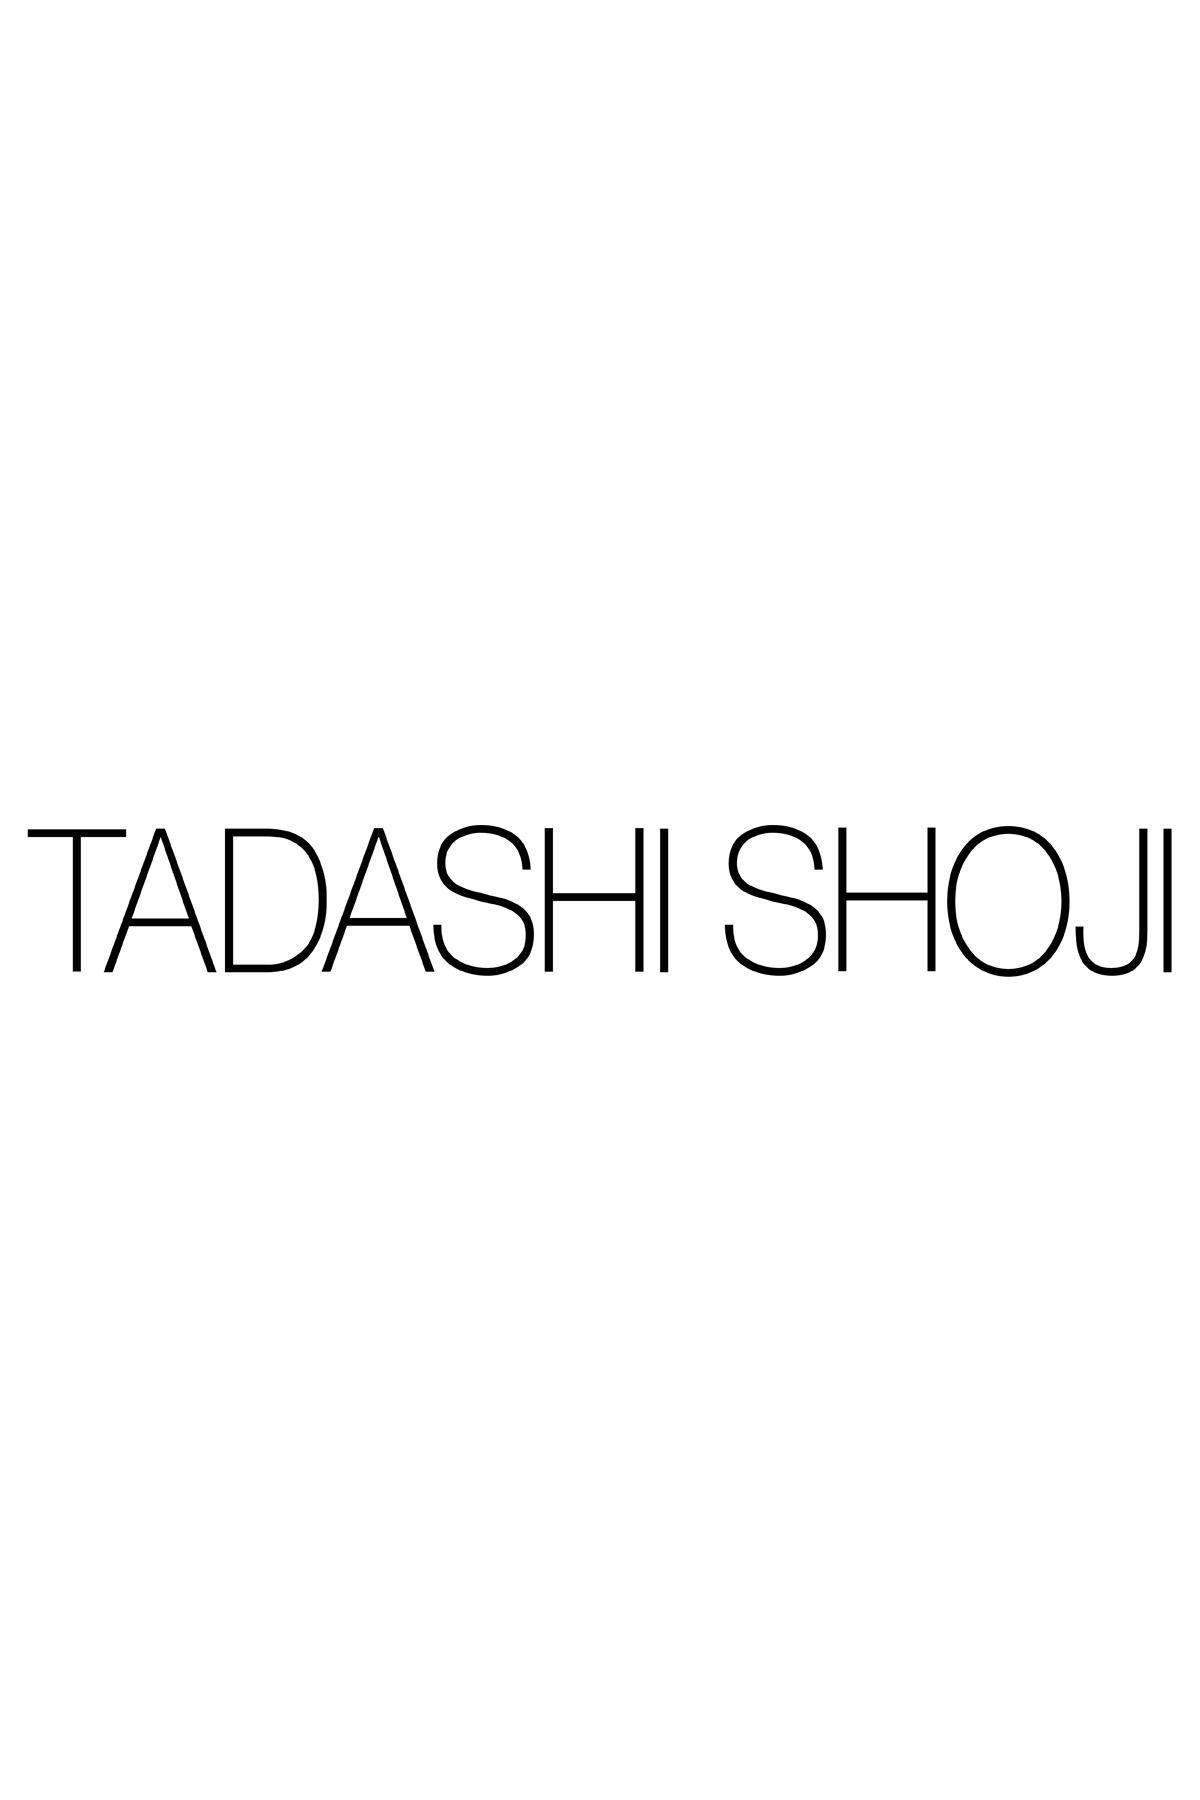 Embroidered Lace Blouson Waist Dress - PLUS SIZE | Tadashi Shoji